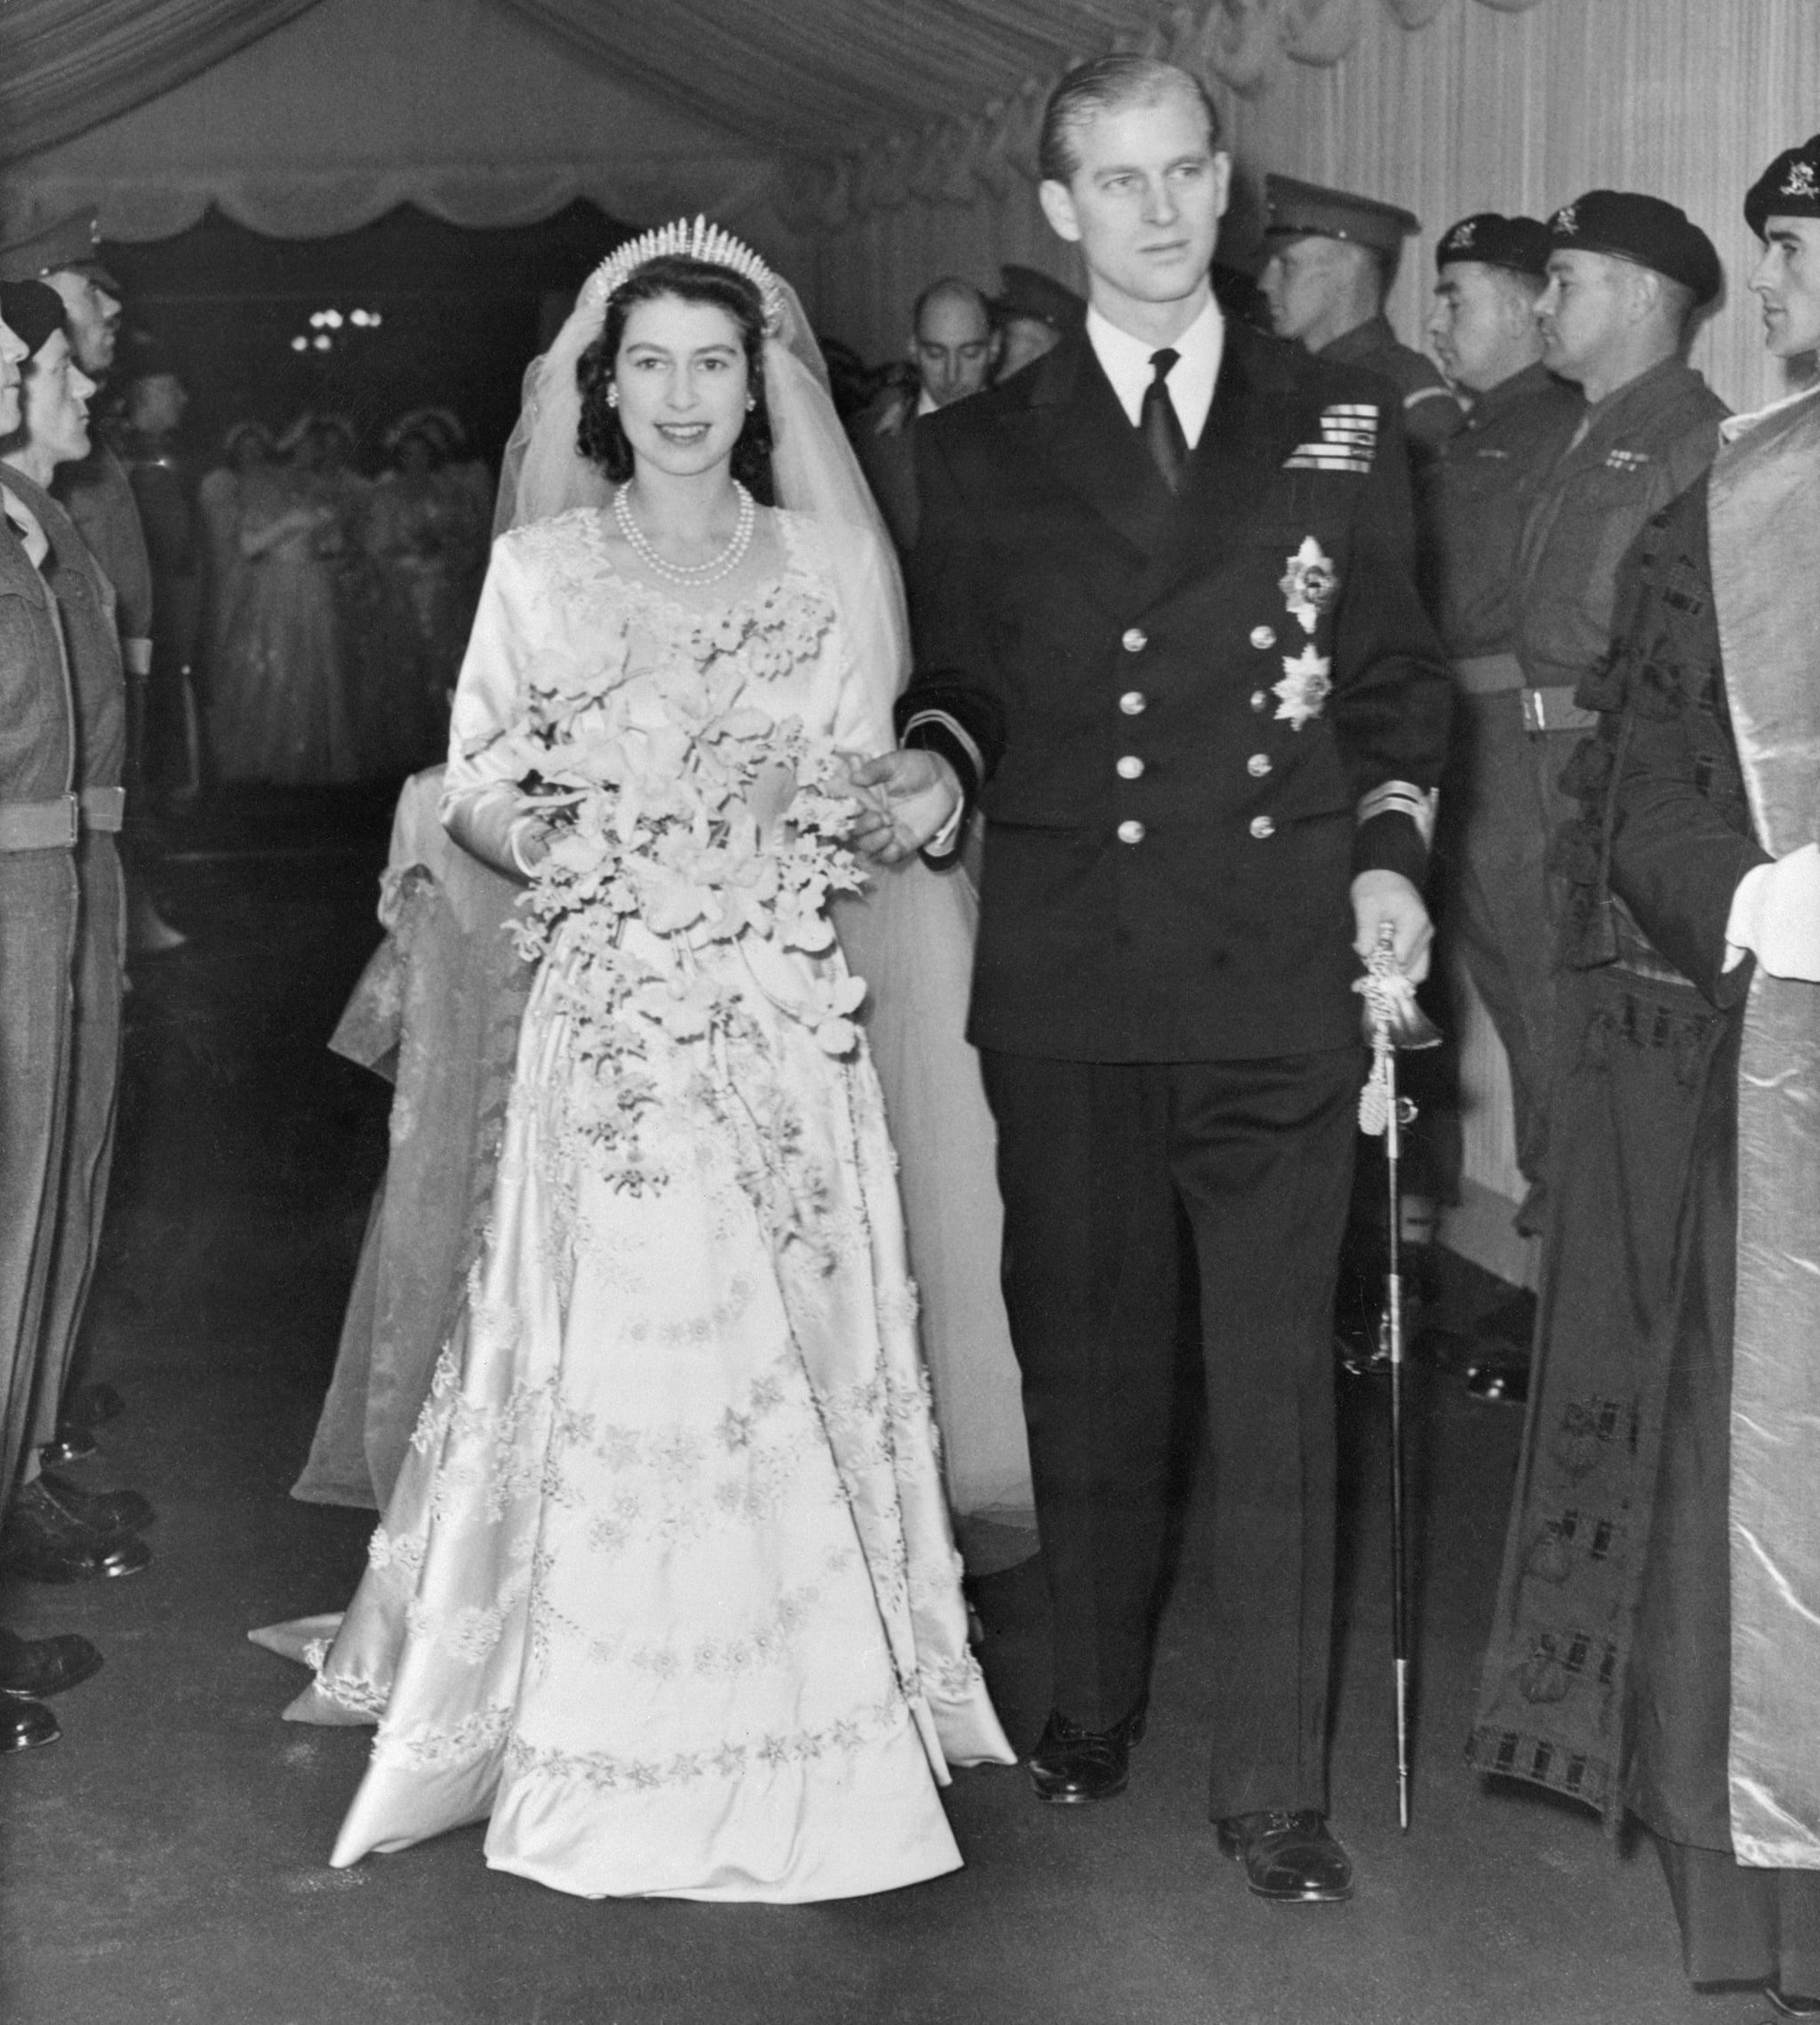 Queen Elizabeth Ii And Prince Philip 1947 Royal Wedding Menus Are Just As Lavish As You Might Think Popsugar Food Photo 3